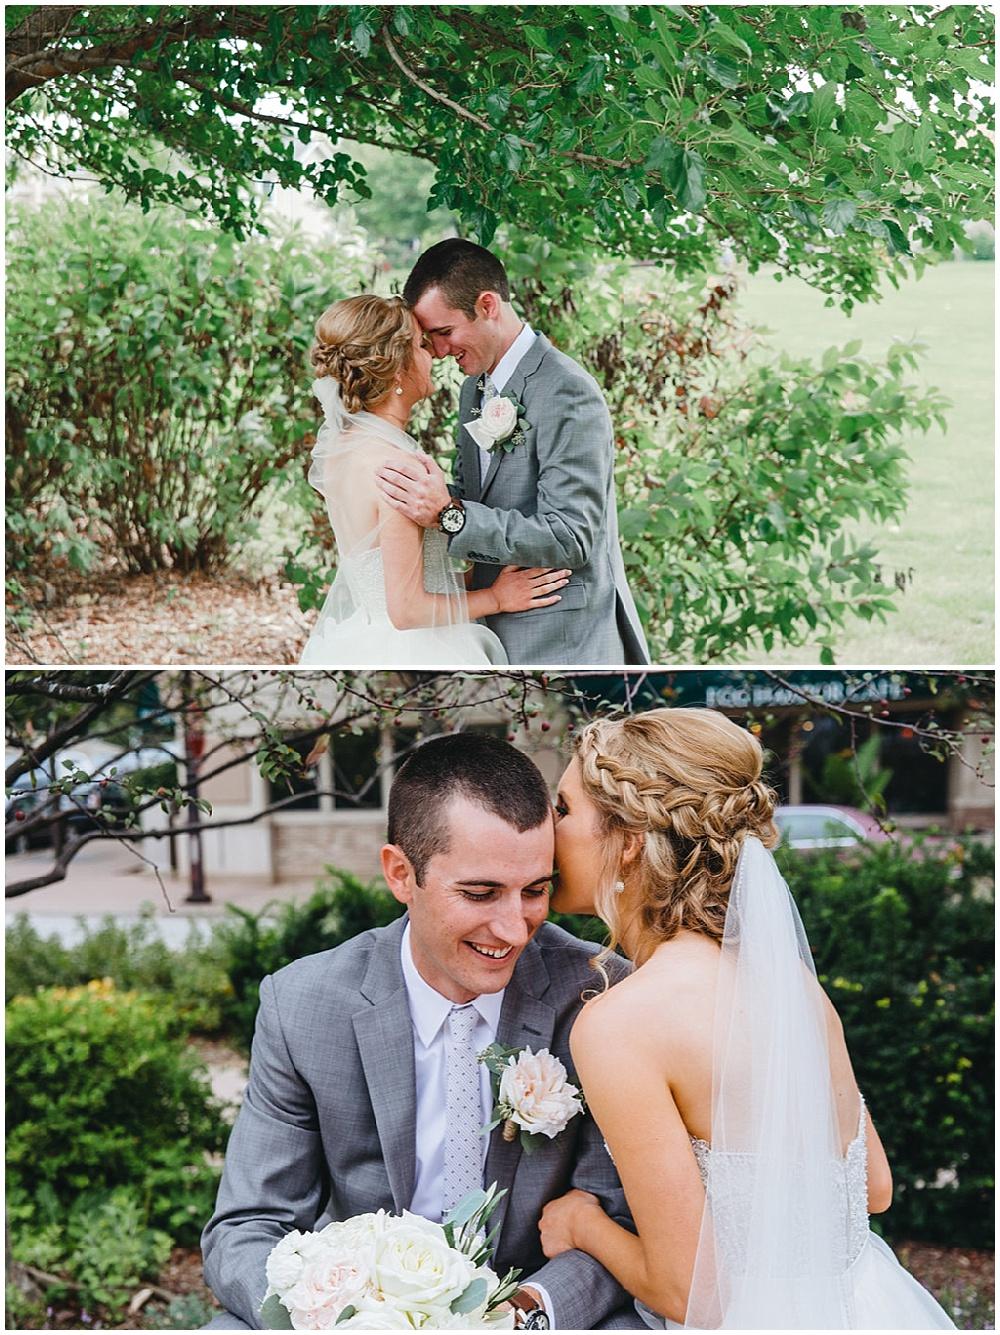 First look   Chicago urban rustic wedding  Sandra Armenteros Photography   Jessica Dum Wedding Coordination